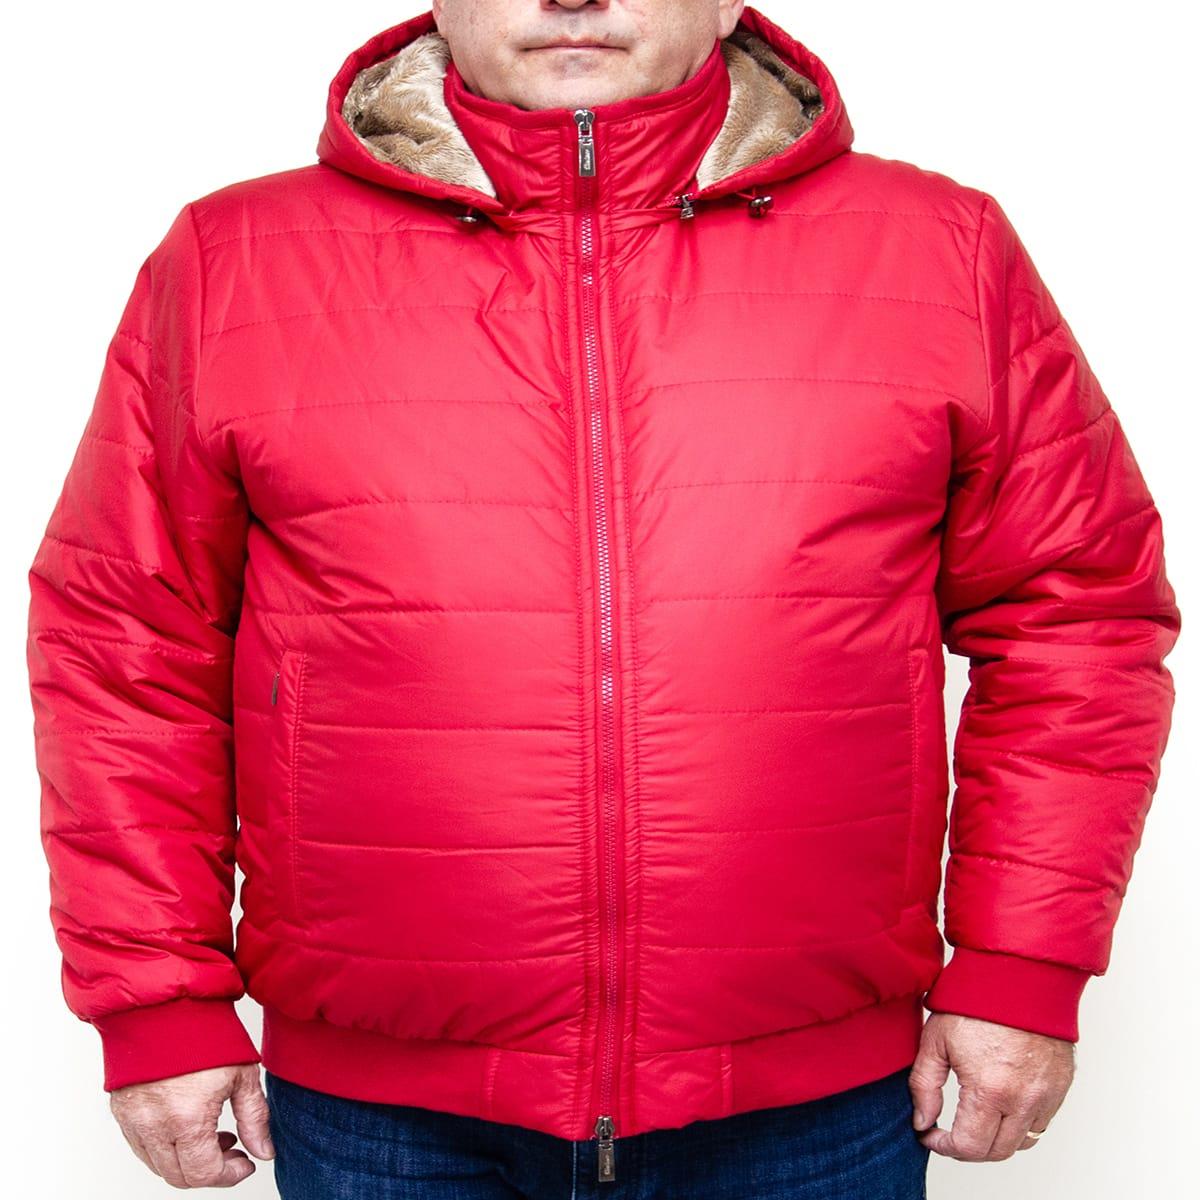 Geaca de iarna rosie cu gluga din fas , Marime 4XL - egato.ro